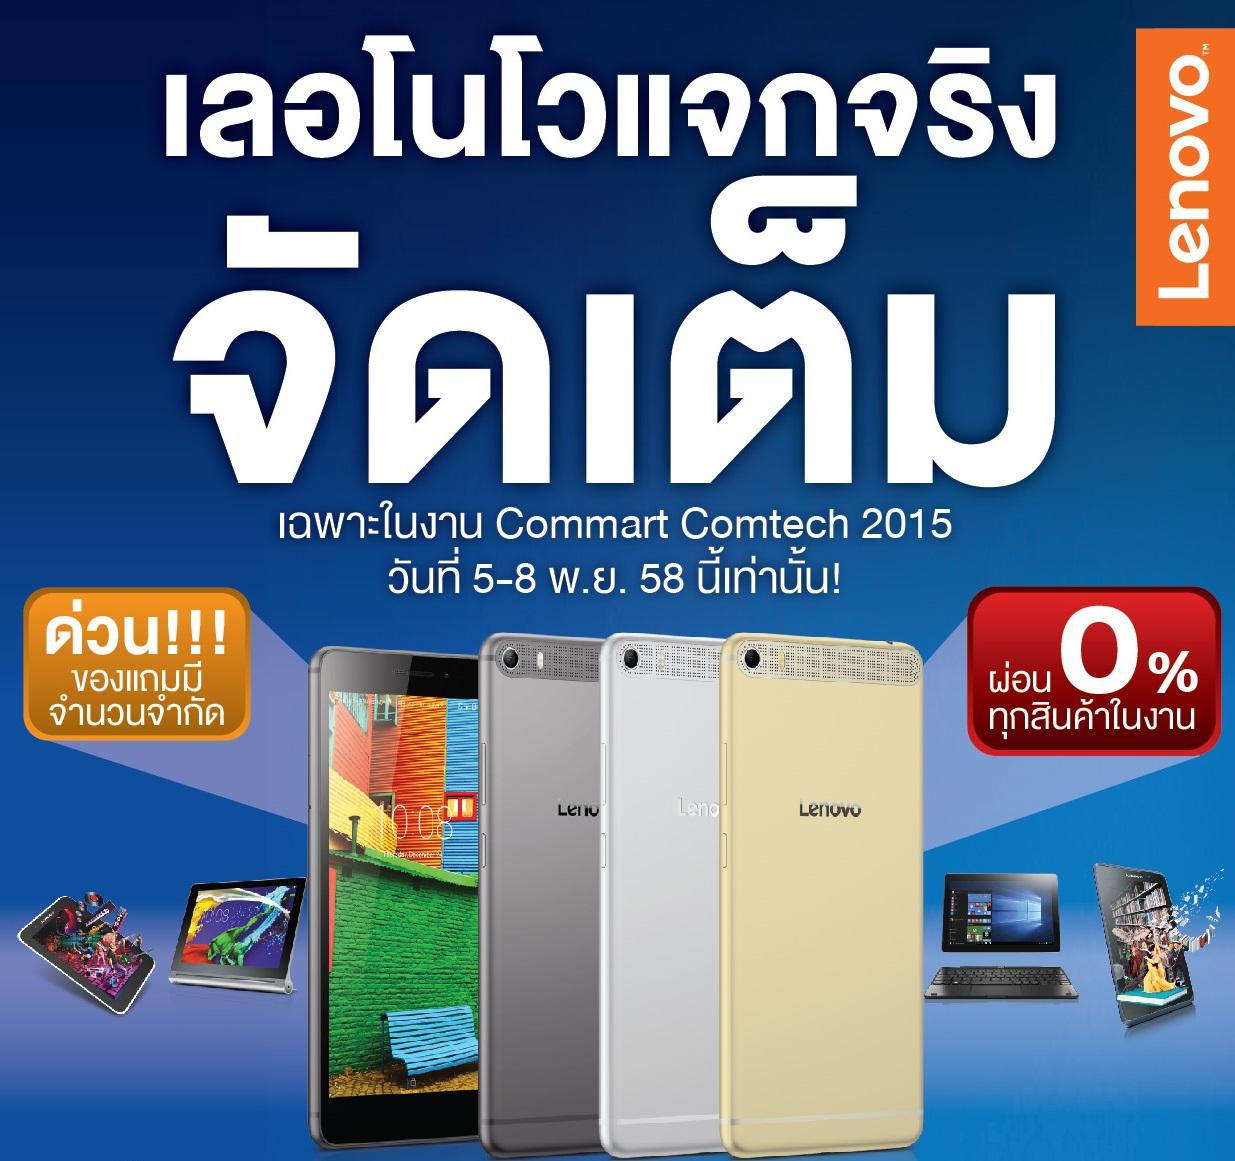 Lenovo Commart Comtech 2015